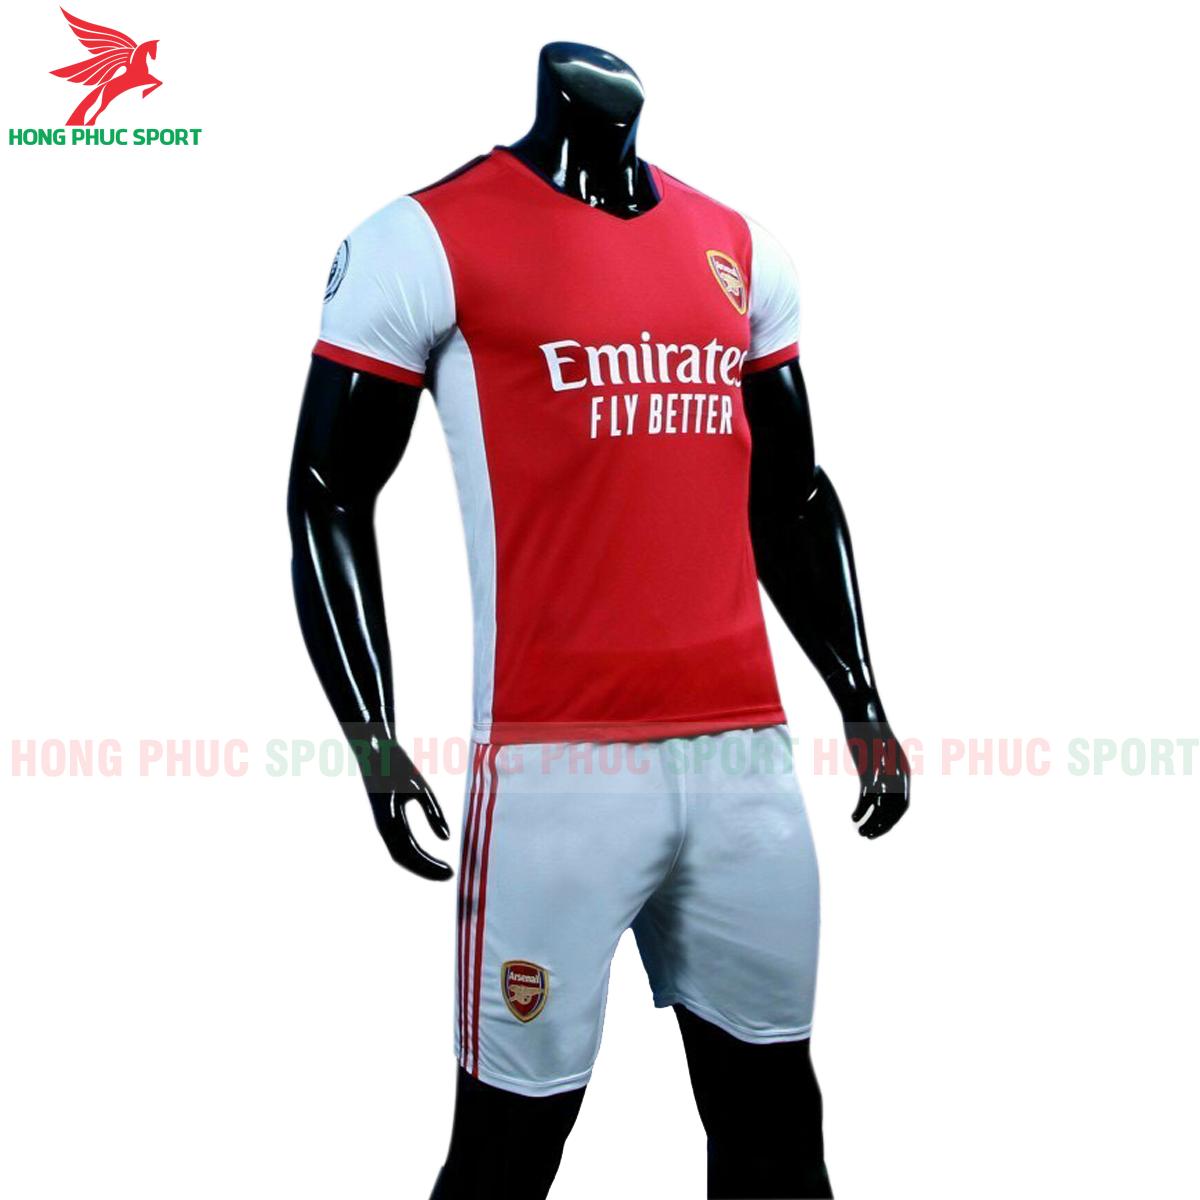 https://cdn.hongphucsport.com/unsafe/s4.shopbay.vn/files/285/ao-bong-da-arsenal-2021-2022-san-nha-thun-lanh-60f240ebb3c48.png